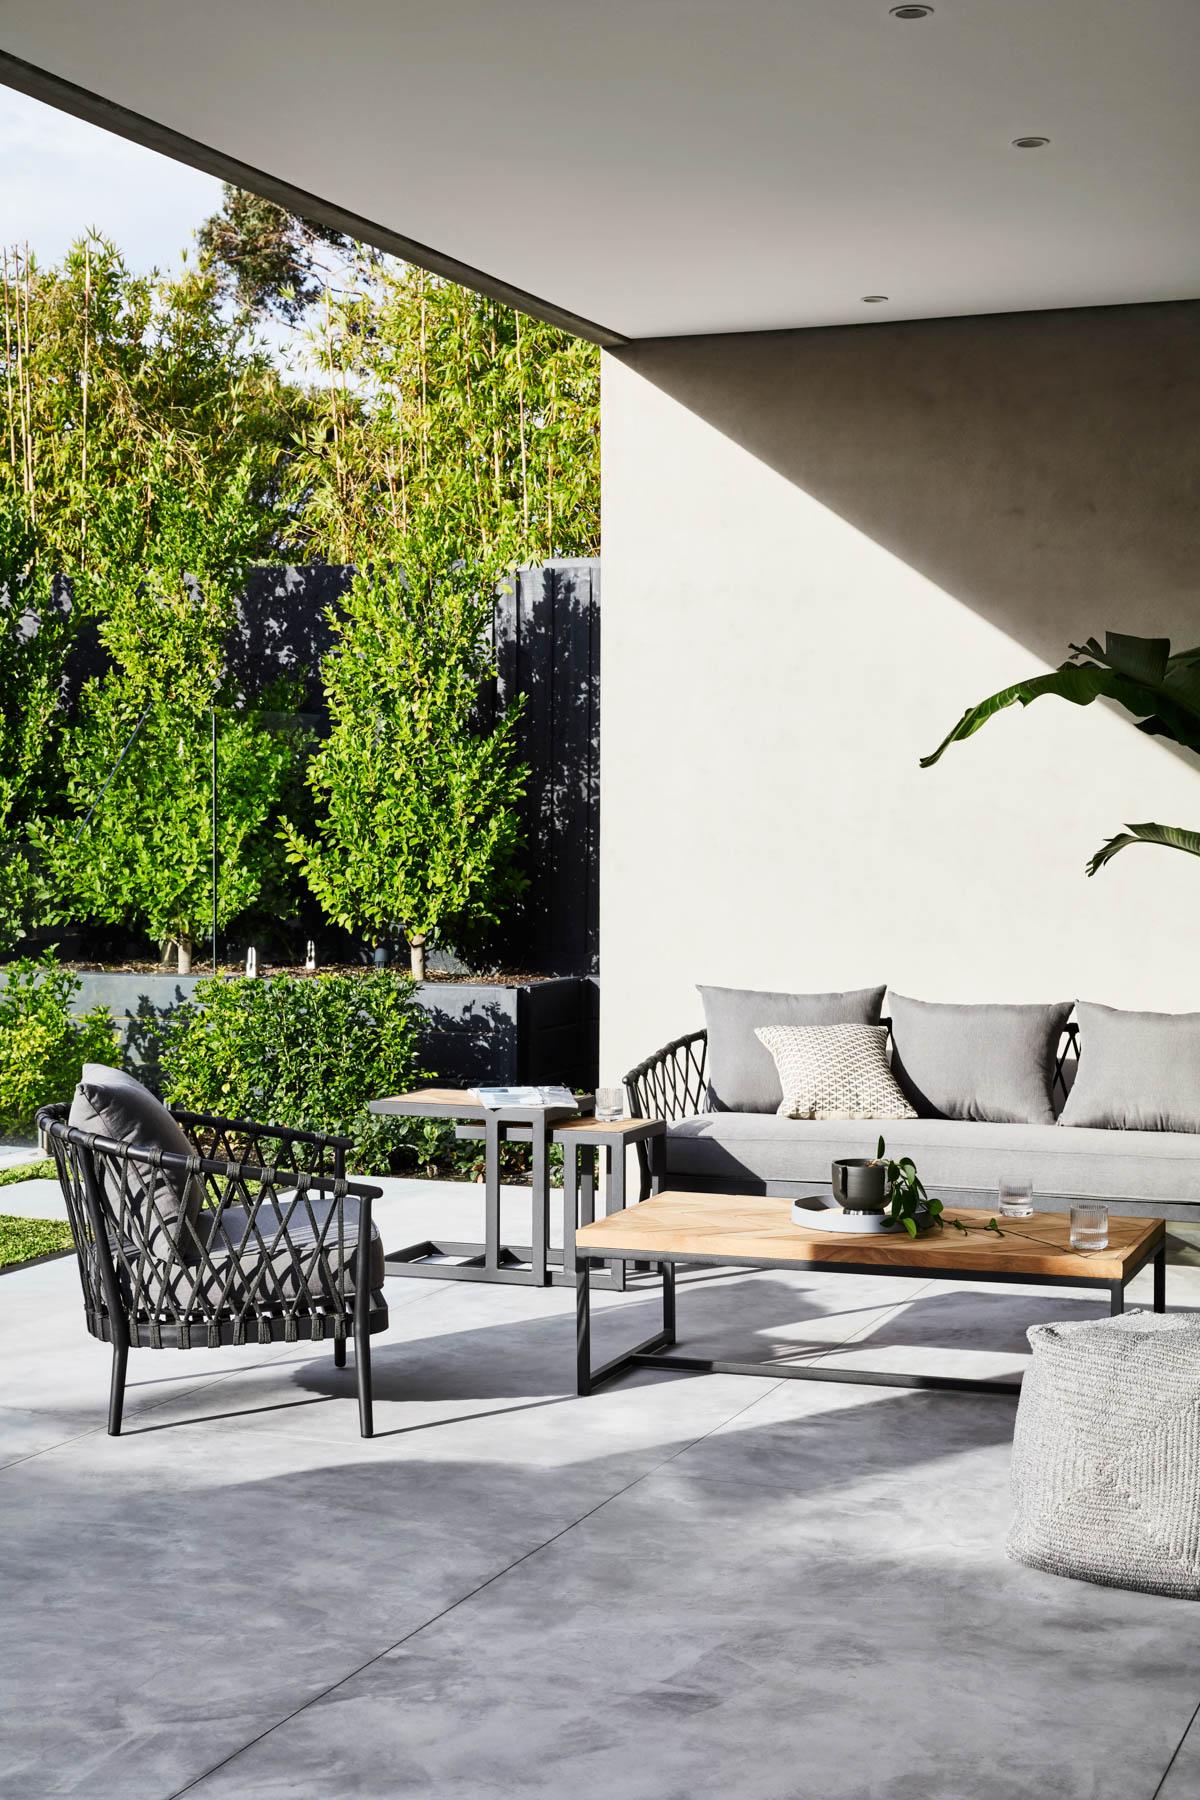 Furniture Gallery Sofas maui-three-seater-sofa-01